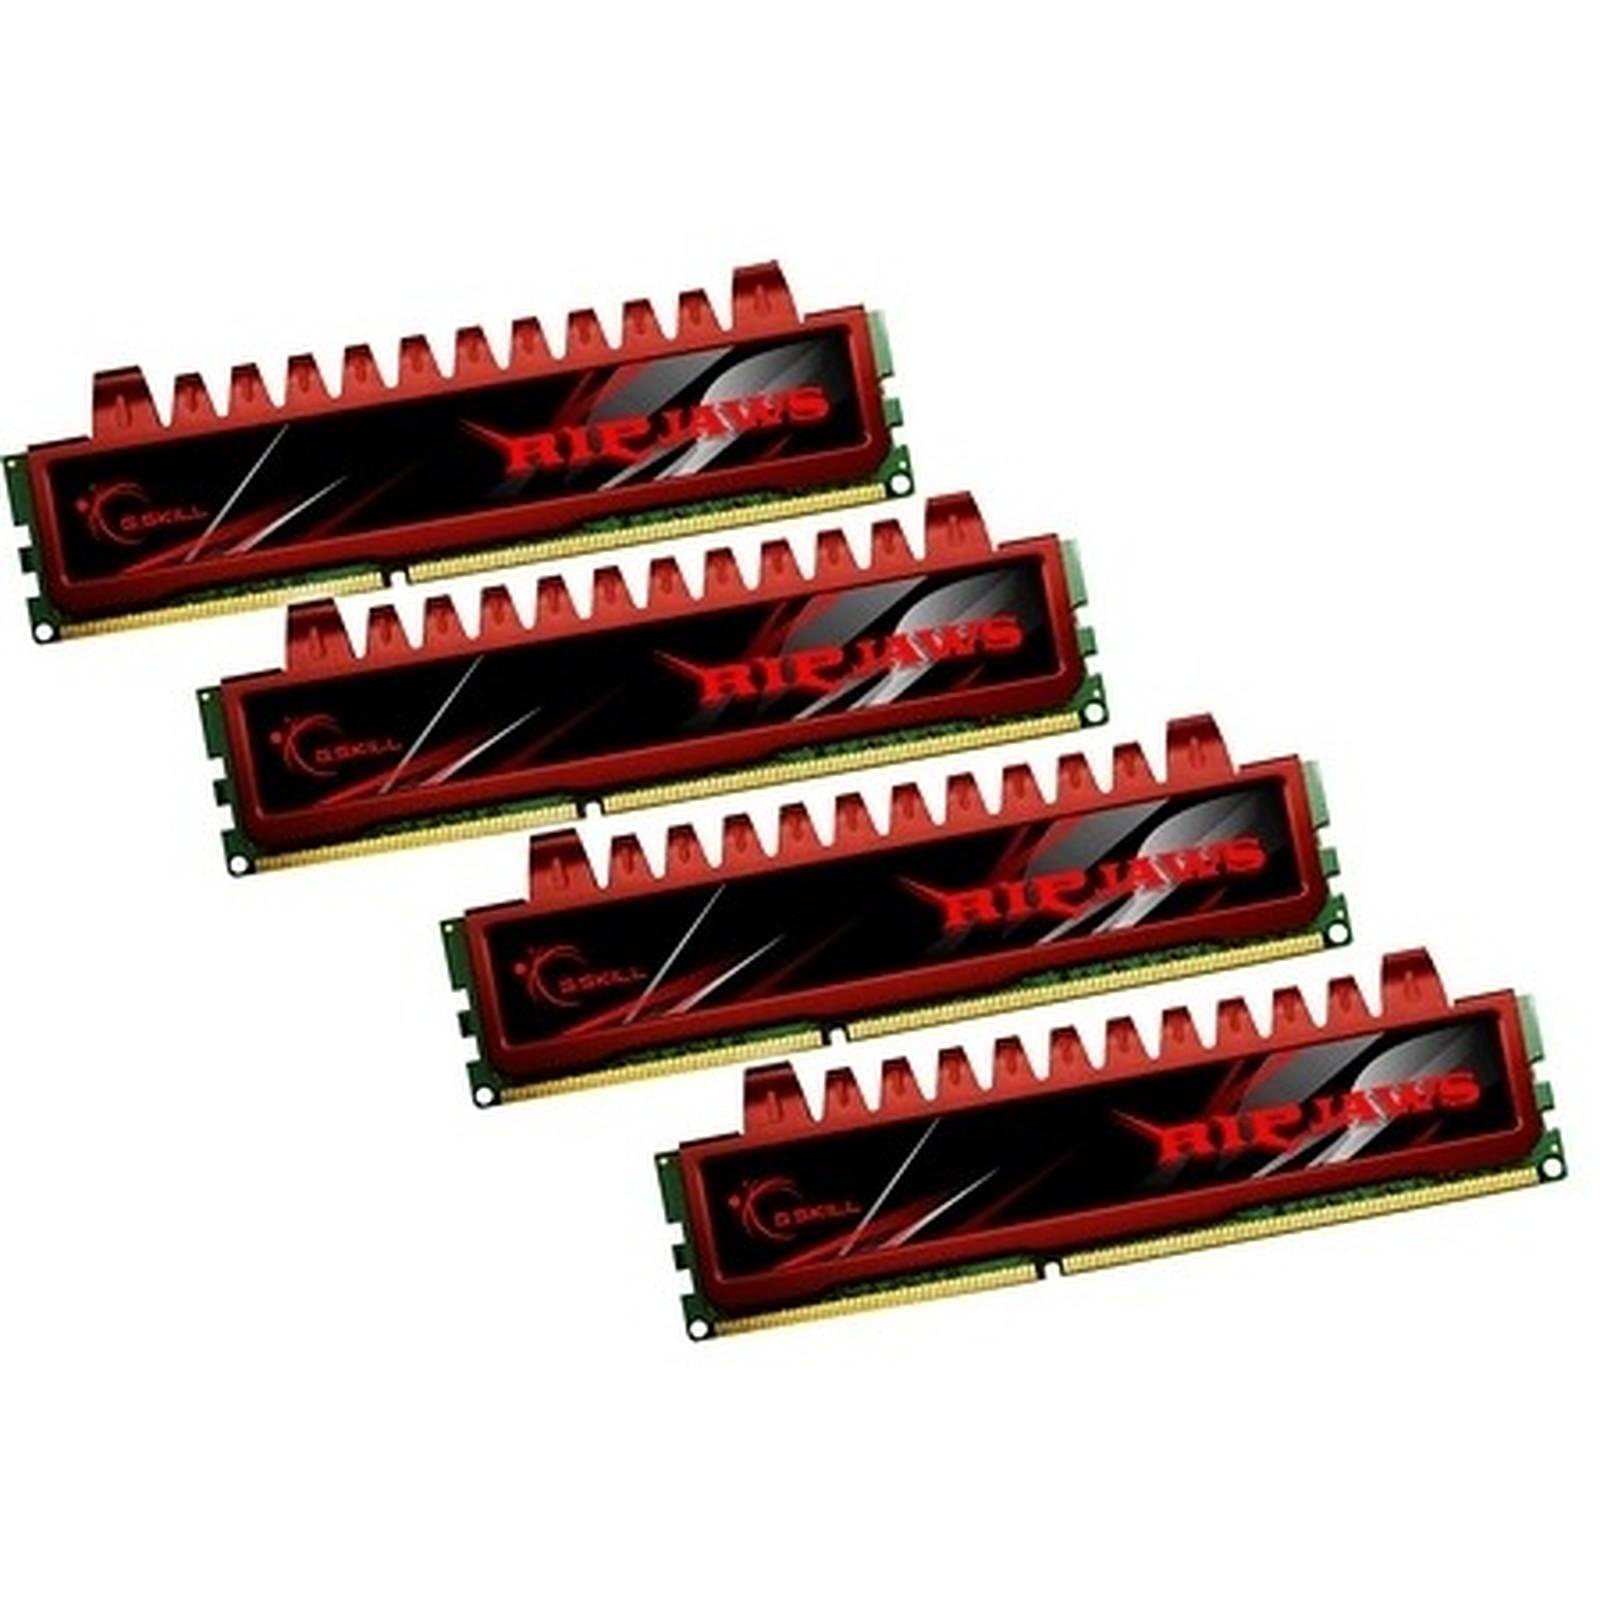 G.Skill RL Series RipJaws 8 Go (kit 4x 2 Go) DDR3 1333 MHz